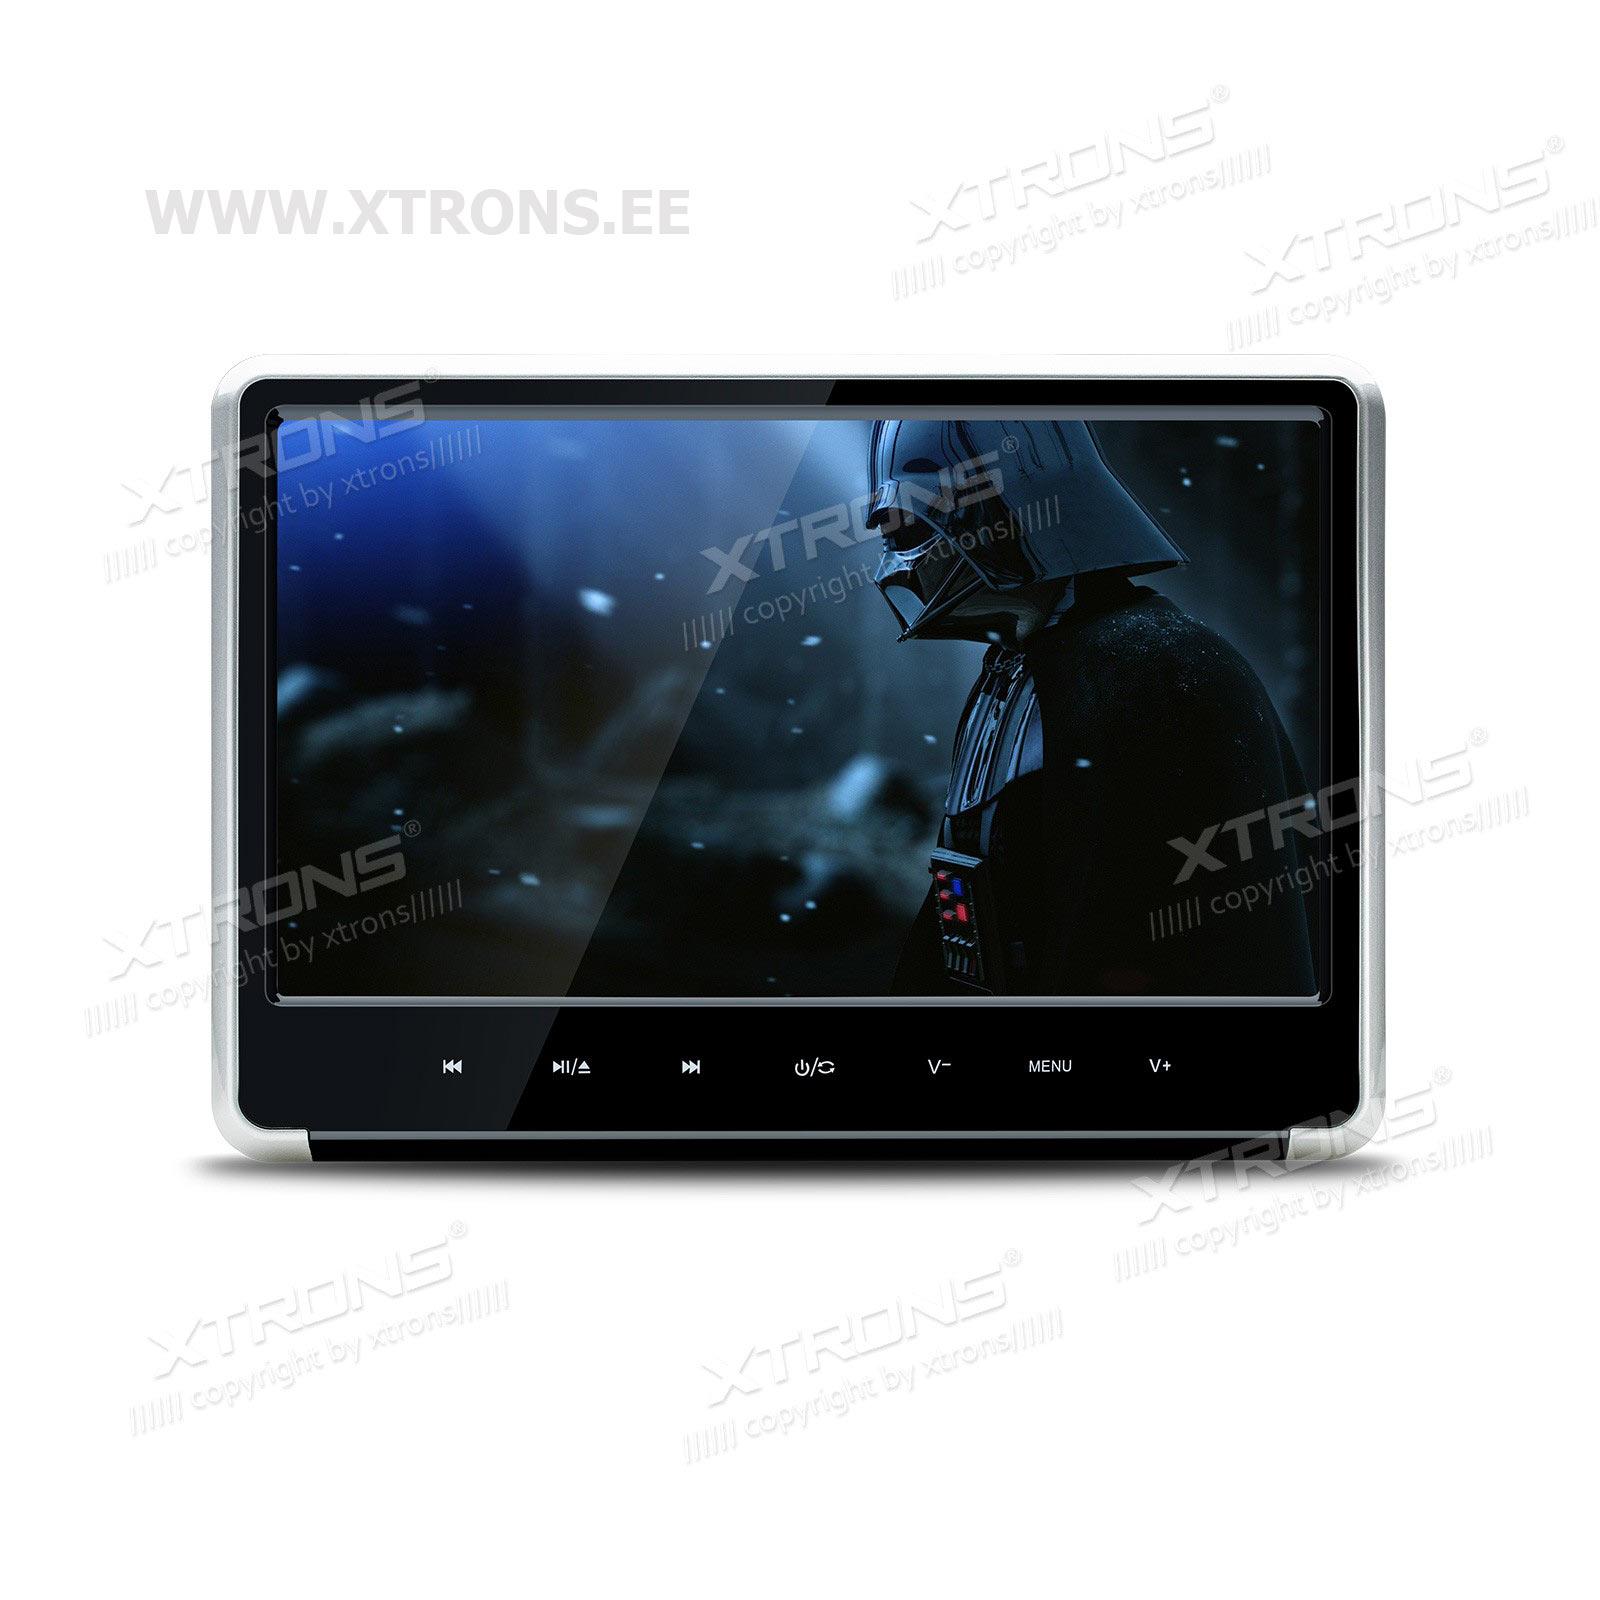 XTRONS HD121HDS